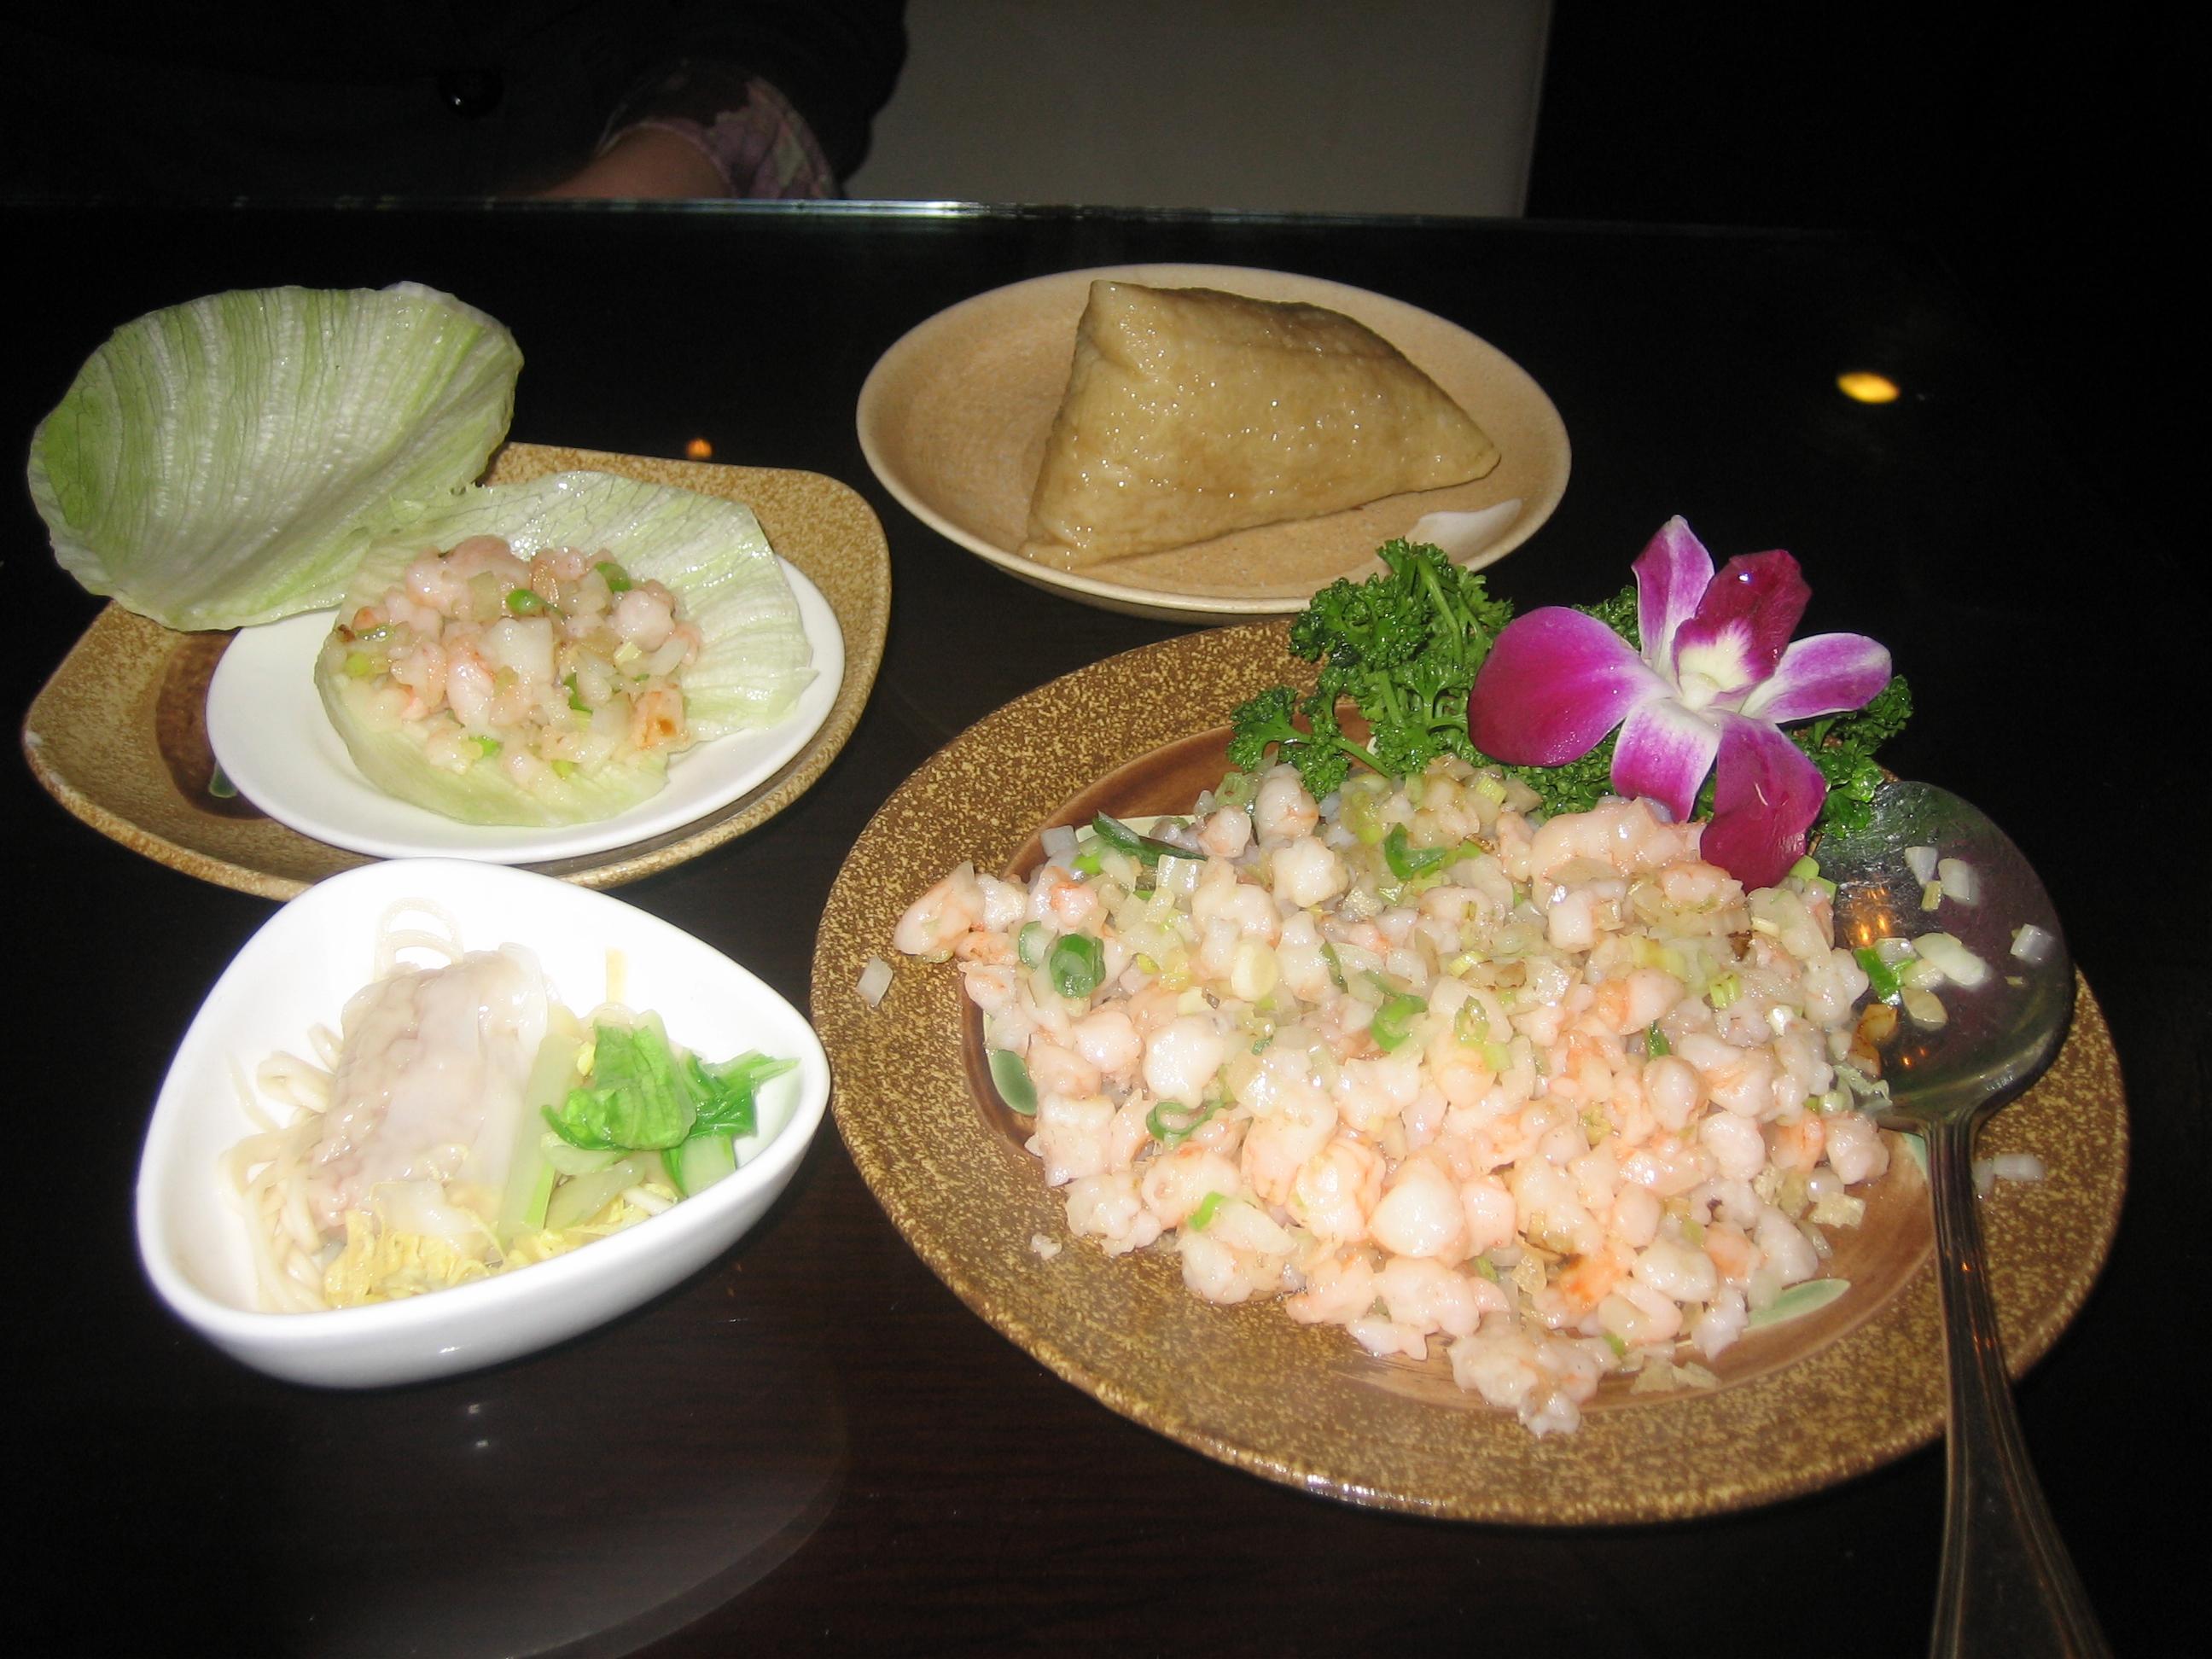 Good dumpling and food in Taipei